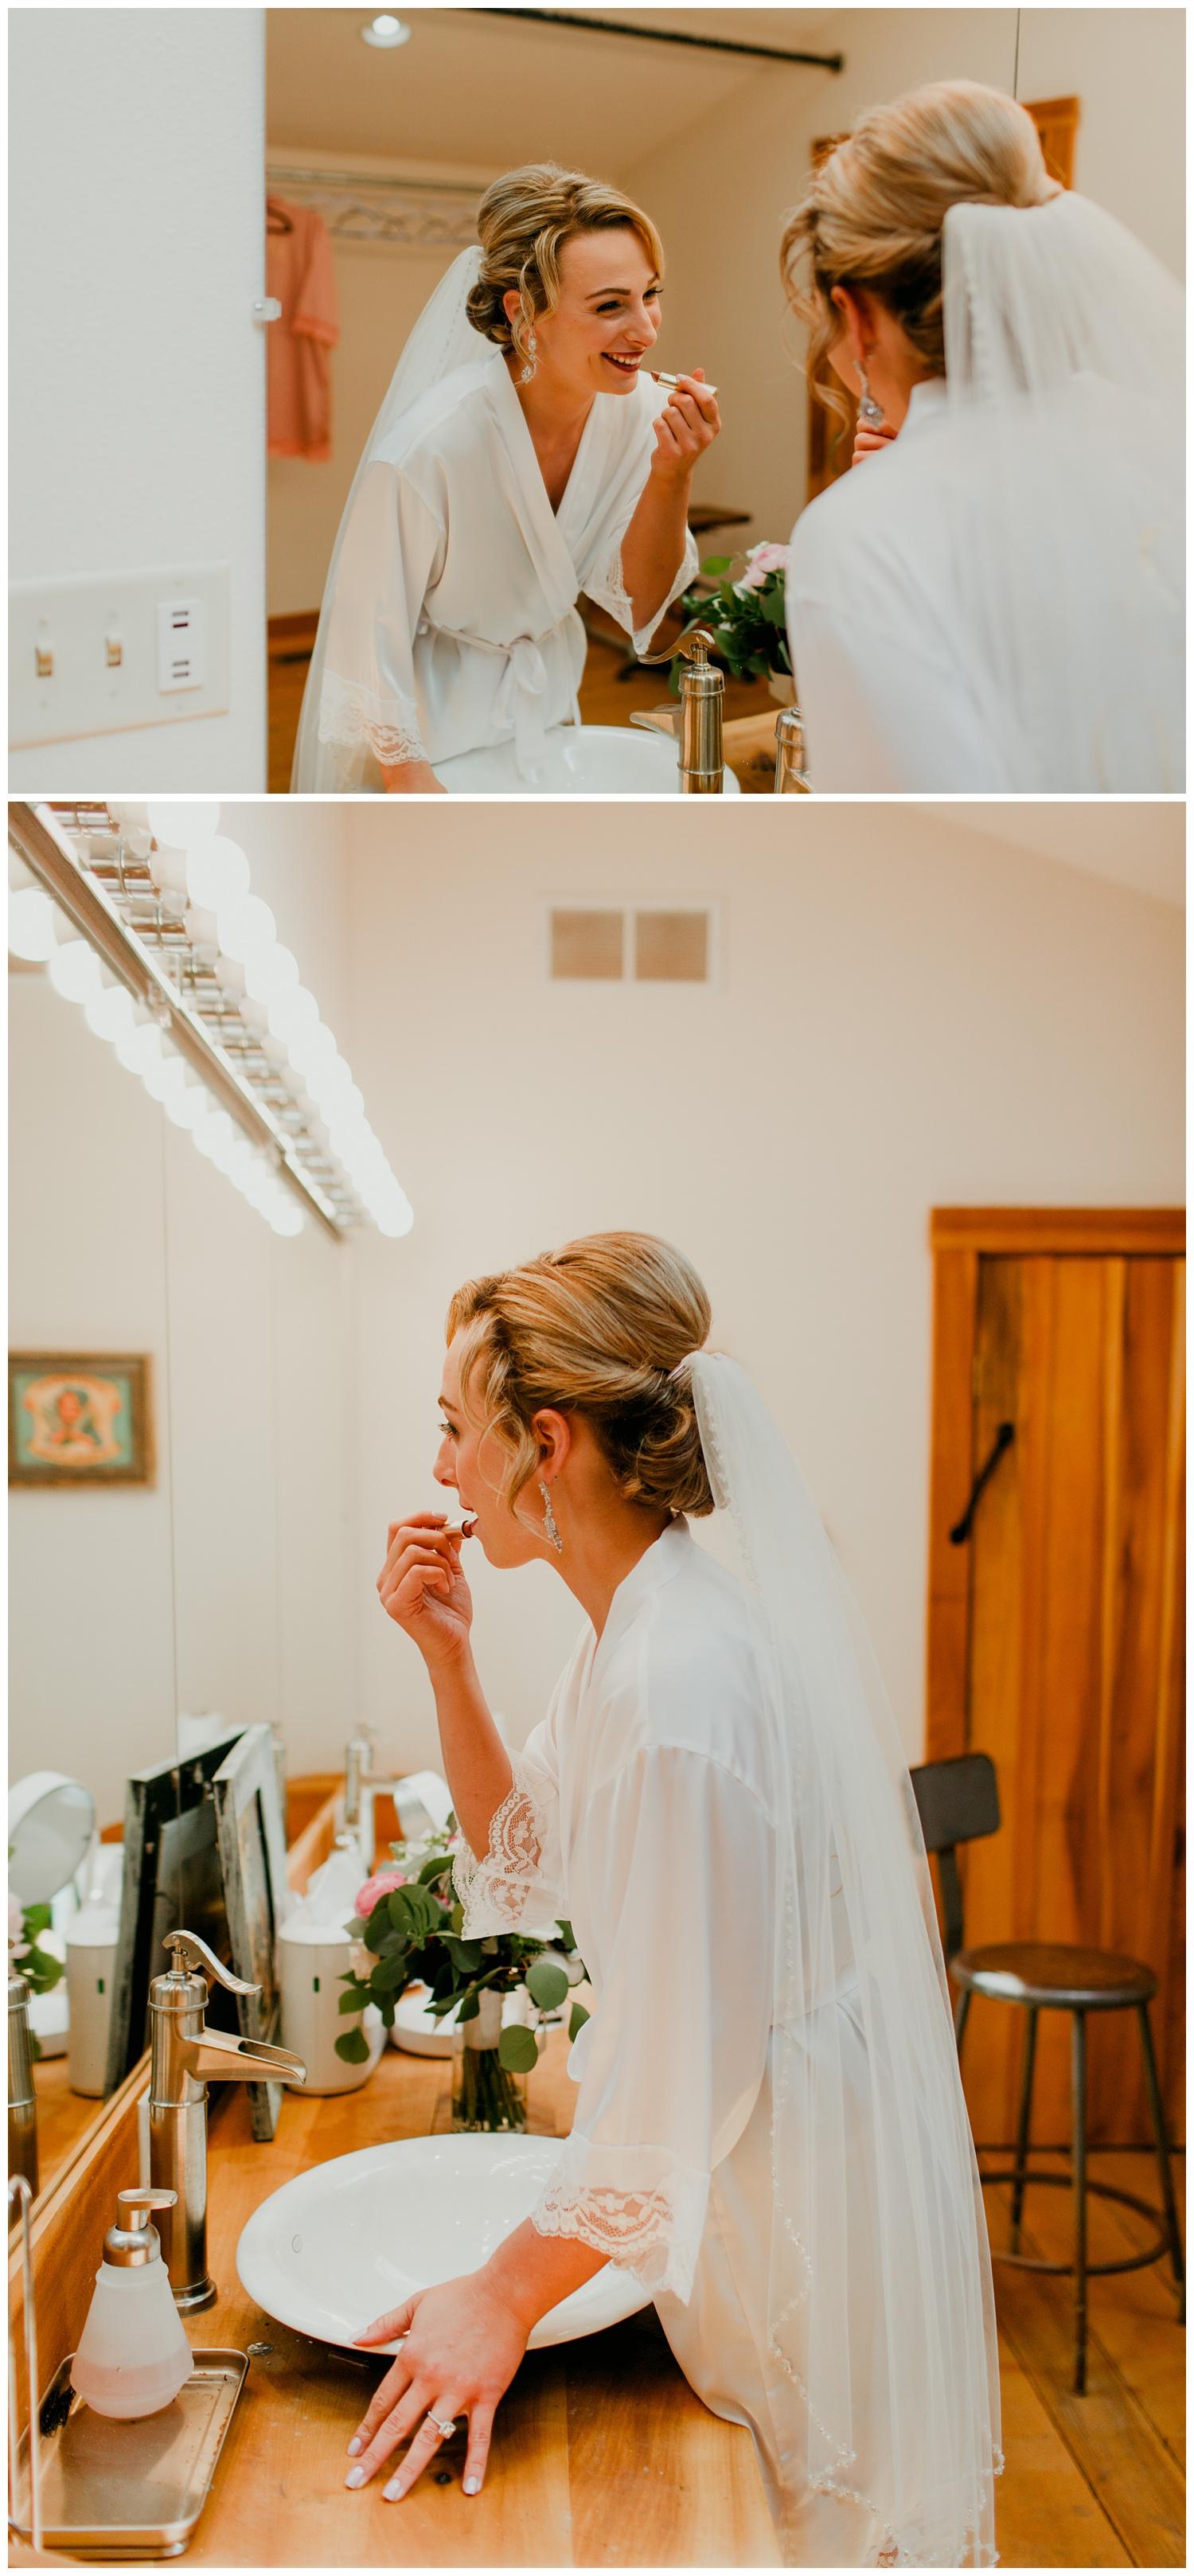 blissfulbarn threeoaks michigan wedding photography journeymandistillery24.jpg